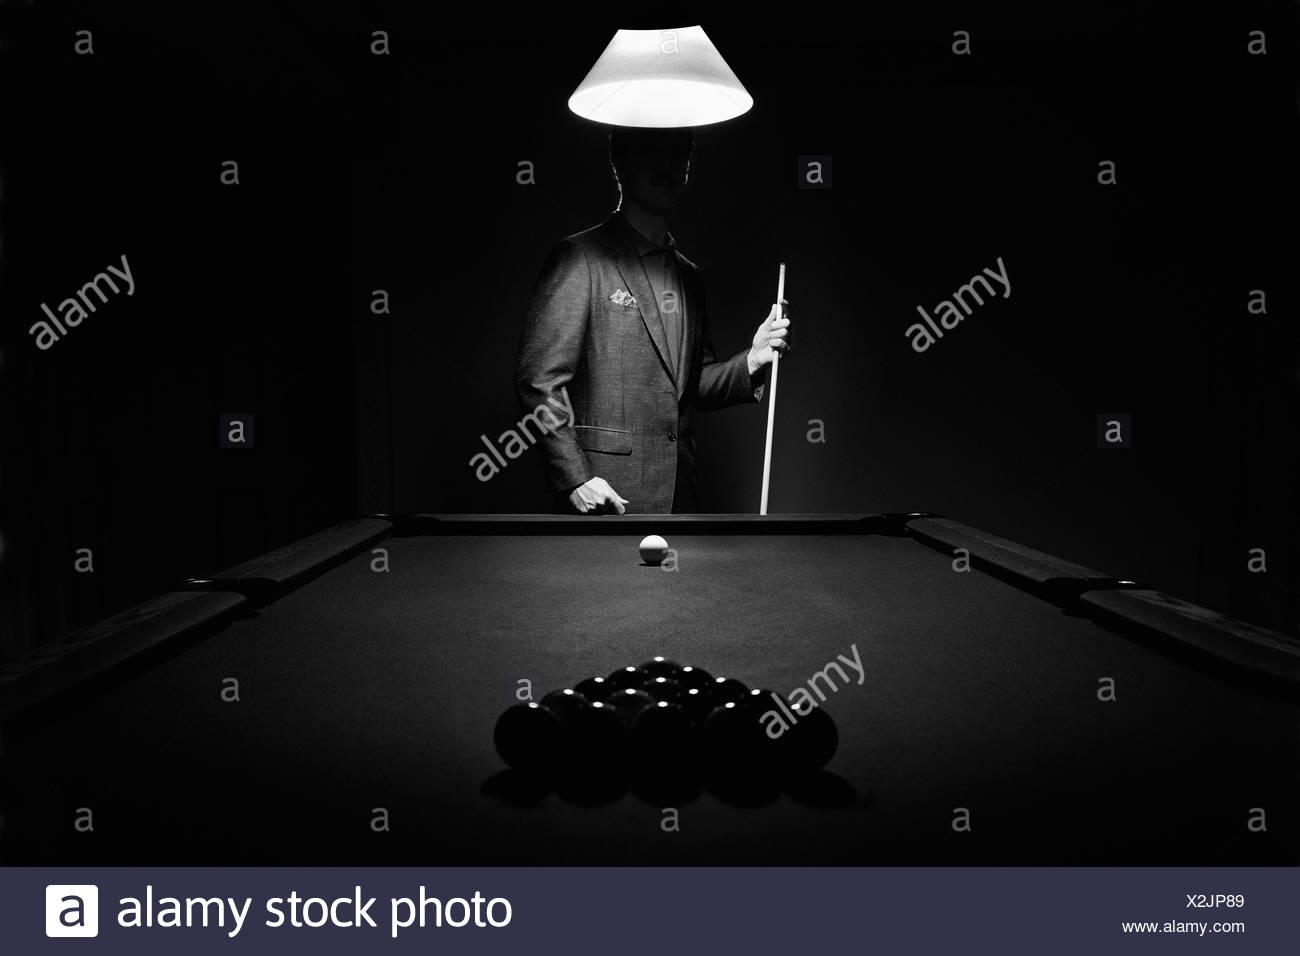 Joueur de billard mystère derrière carré de boules de billard; Edmonton, Alberta, Canada Photo Stock